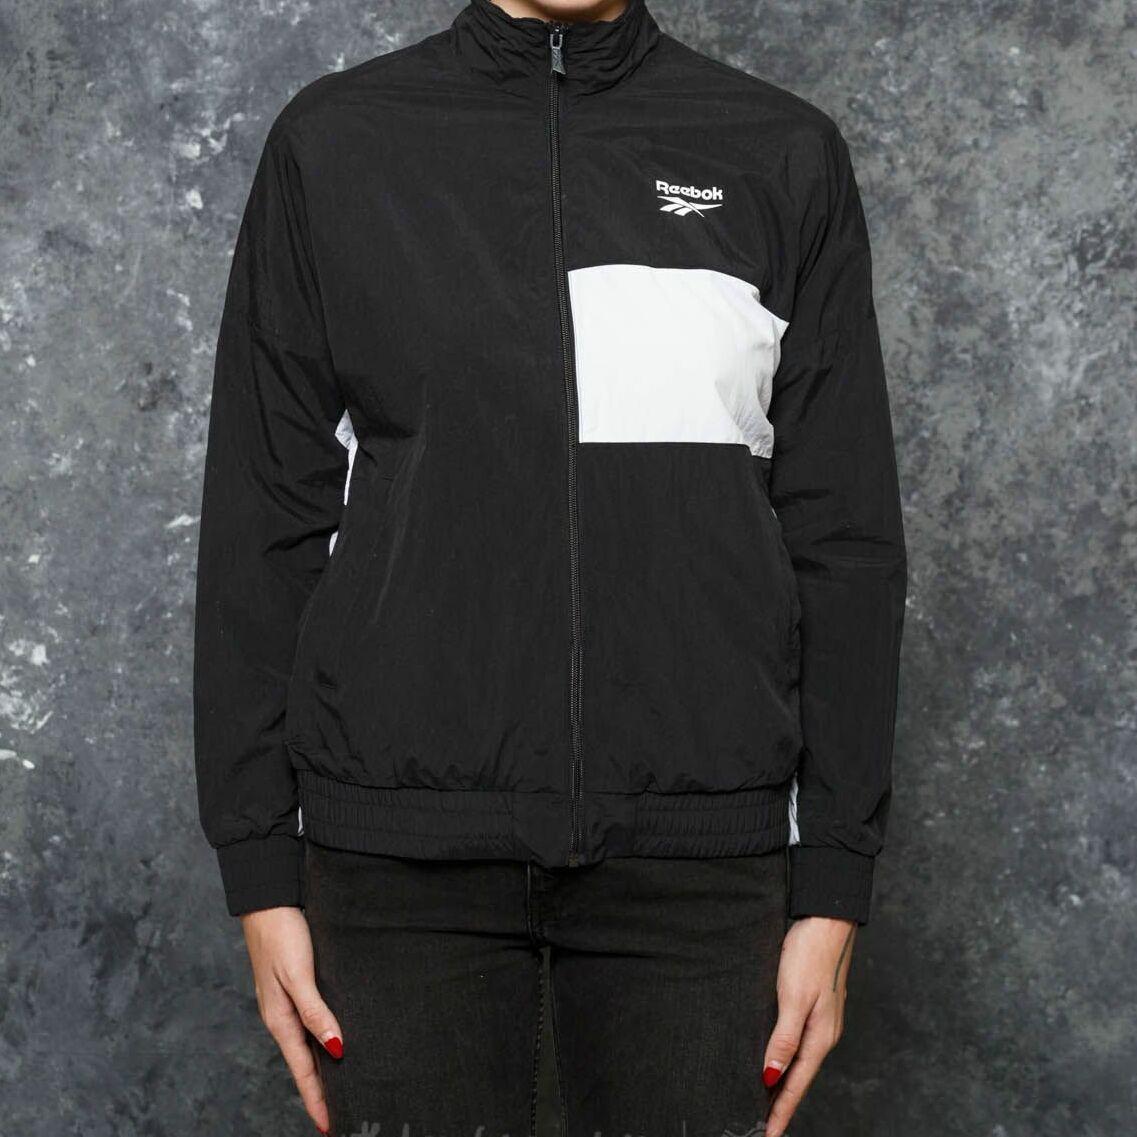 Reebok LF Vector Jacket Black/ Black M